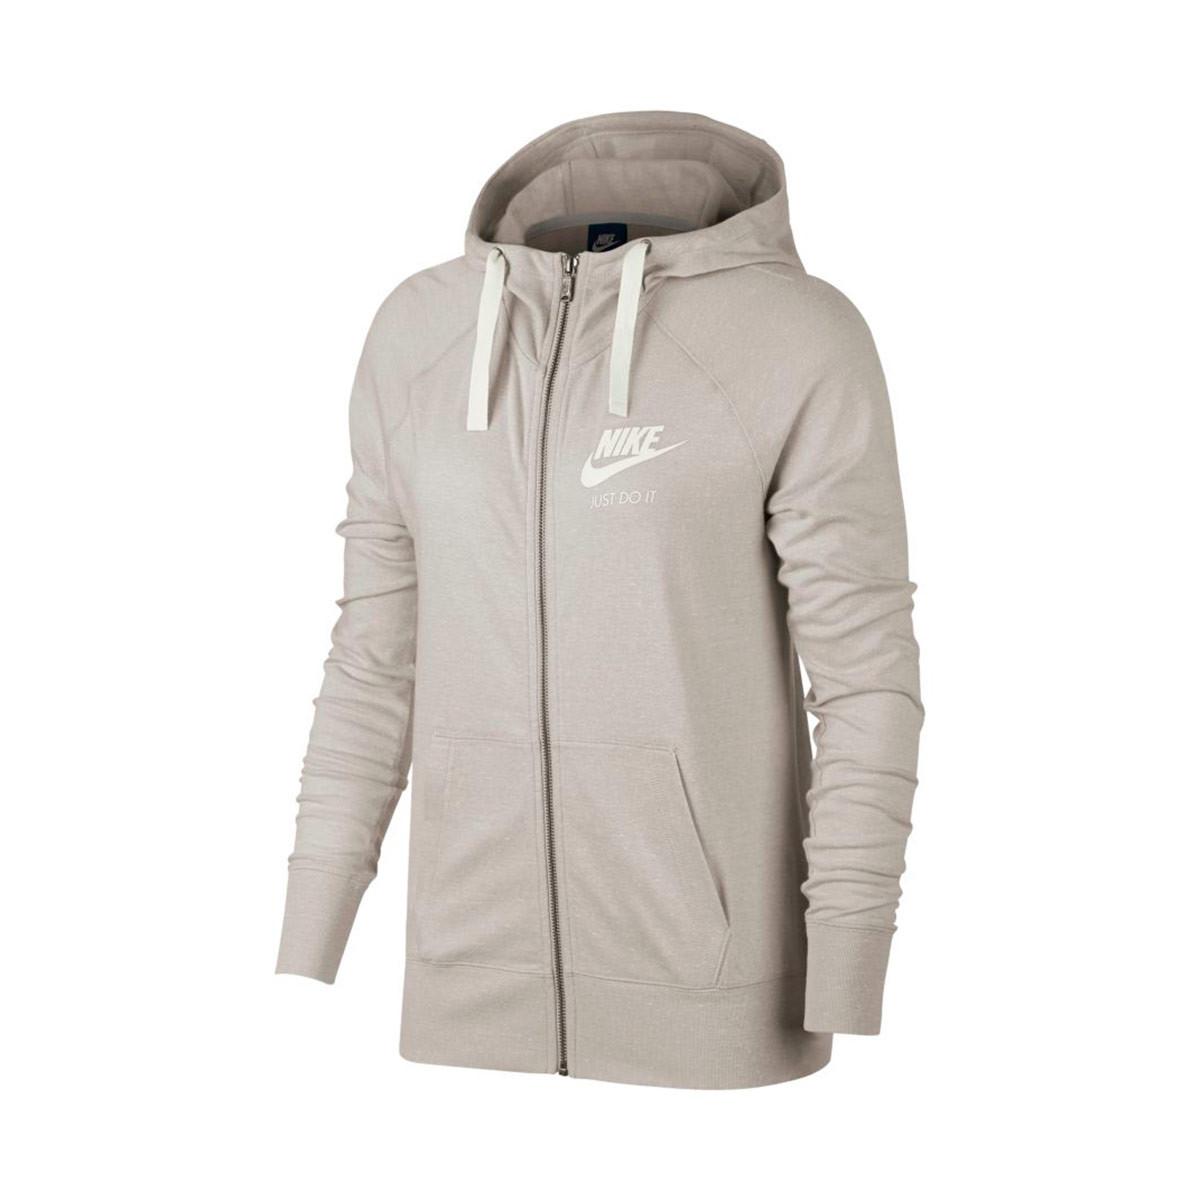 Mujer Sudadera Hoodie Sportswear Oatmeal Sail 1JulT3KcF